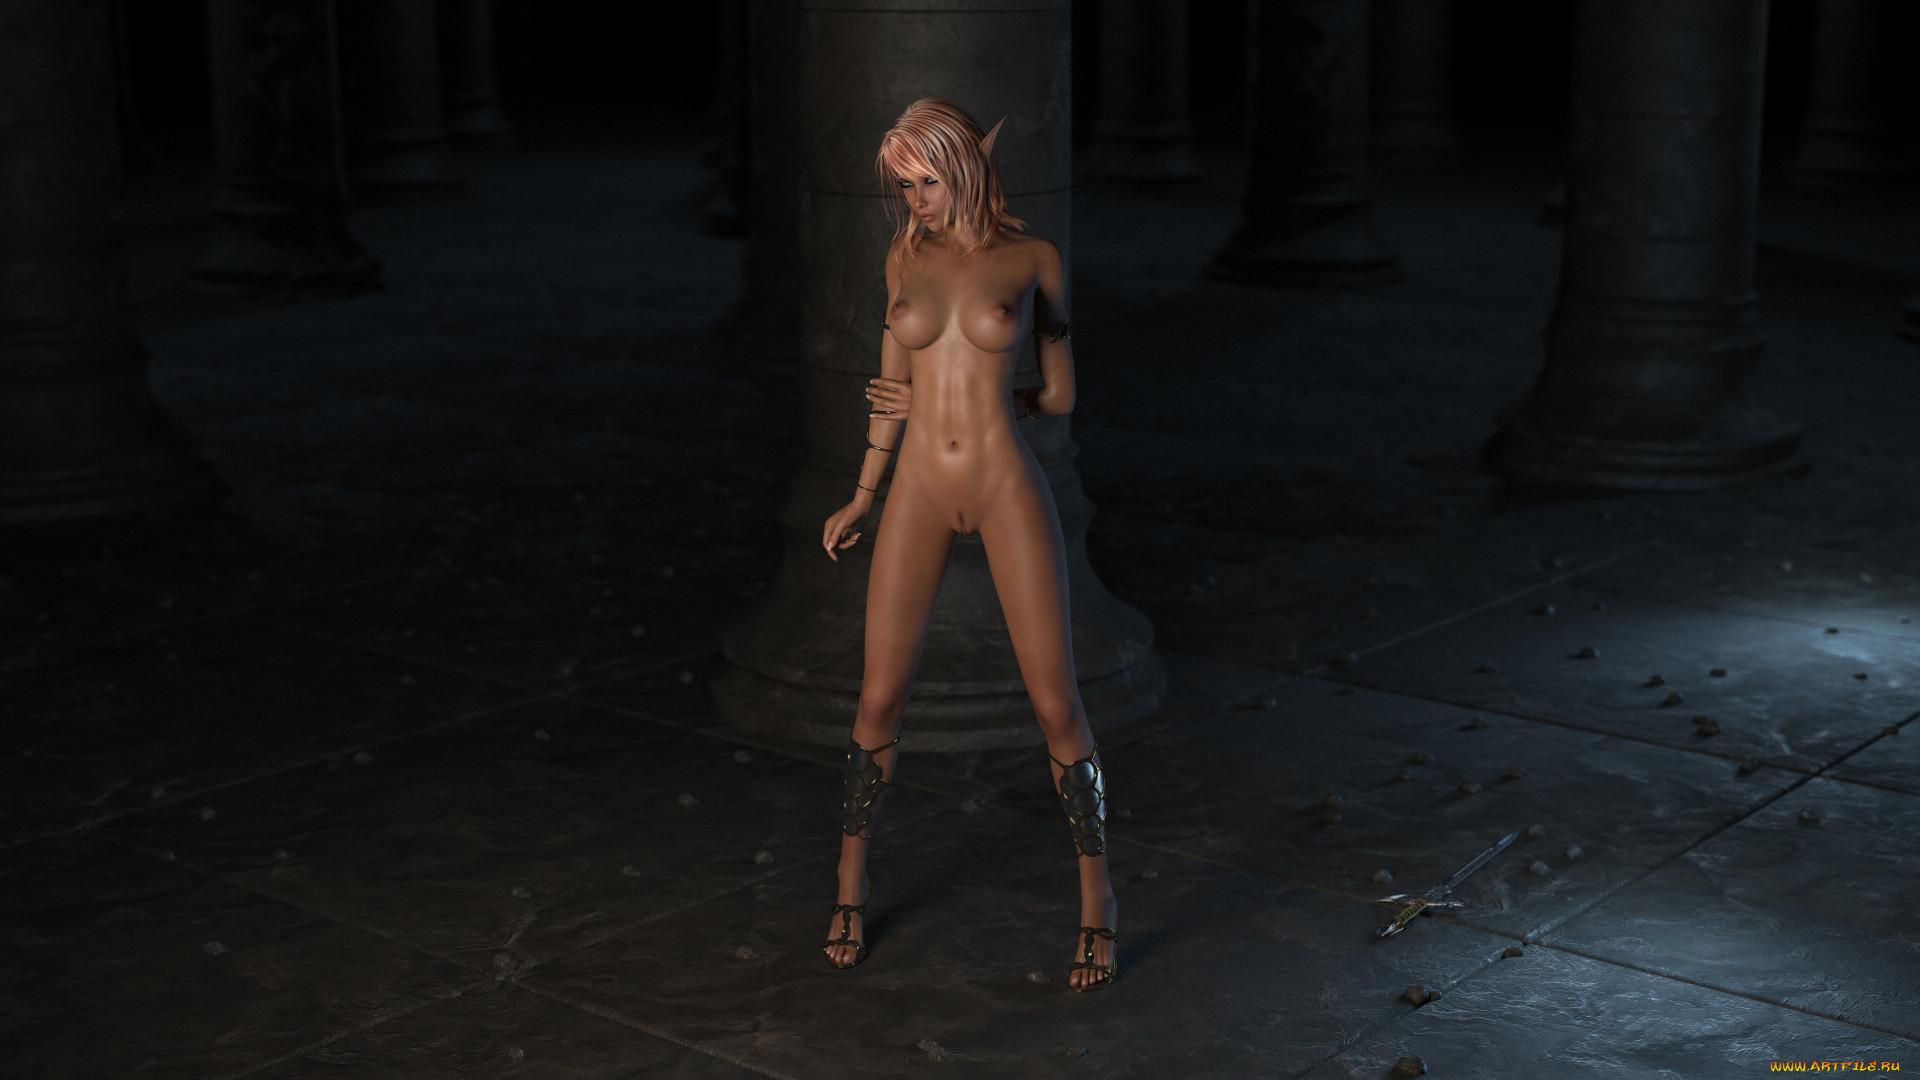 3d elf princess erotic picture sex lovers